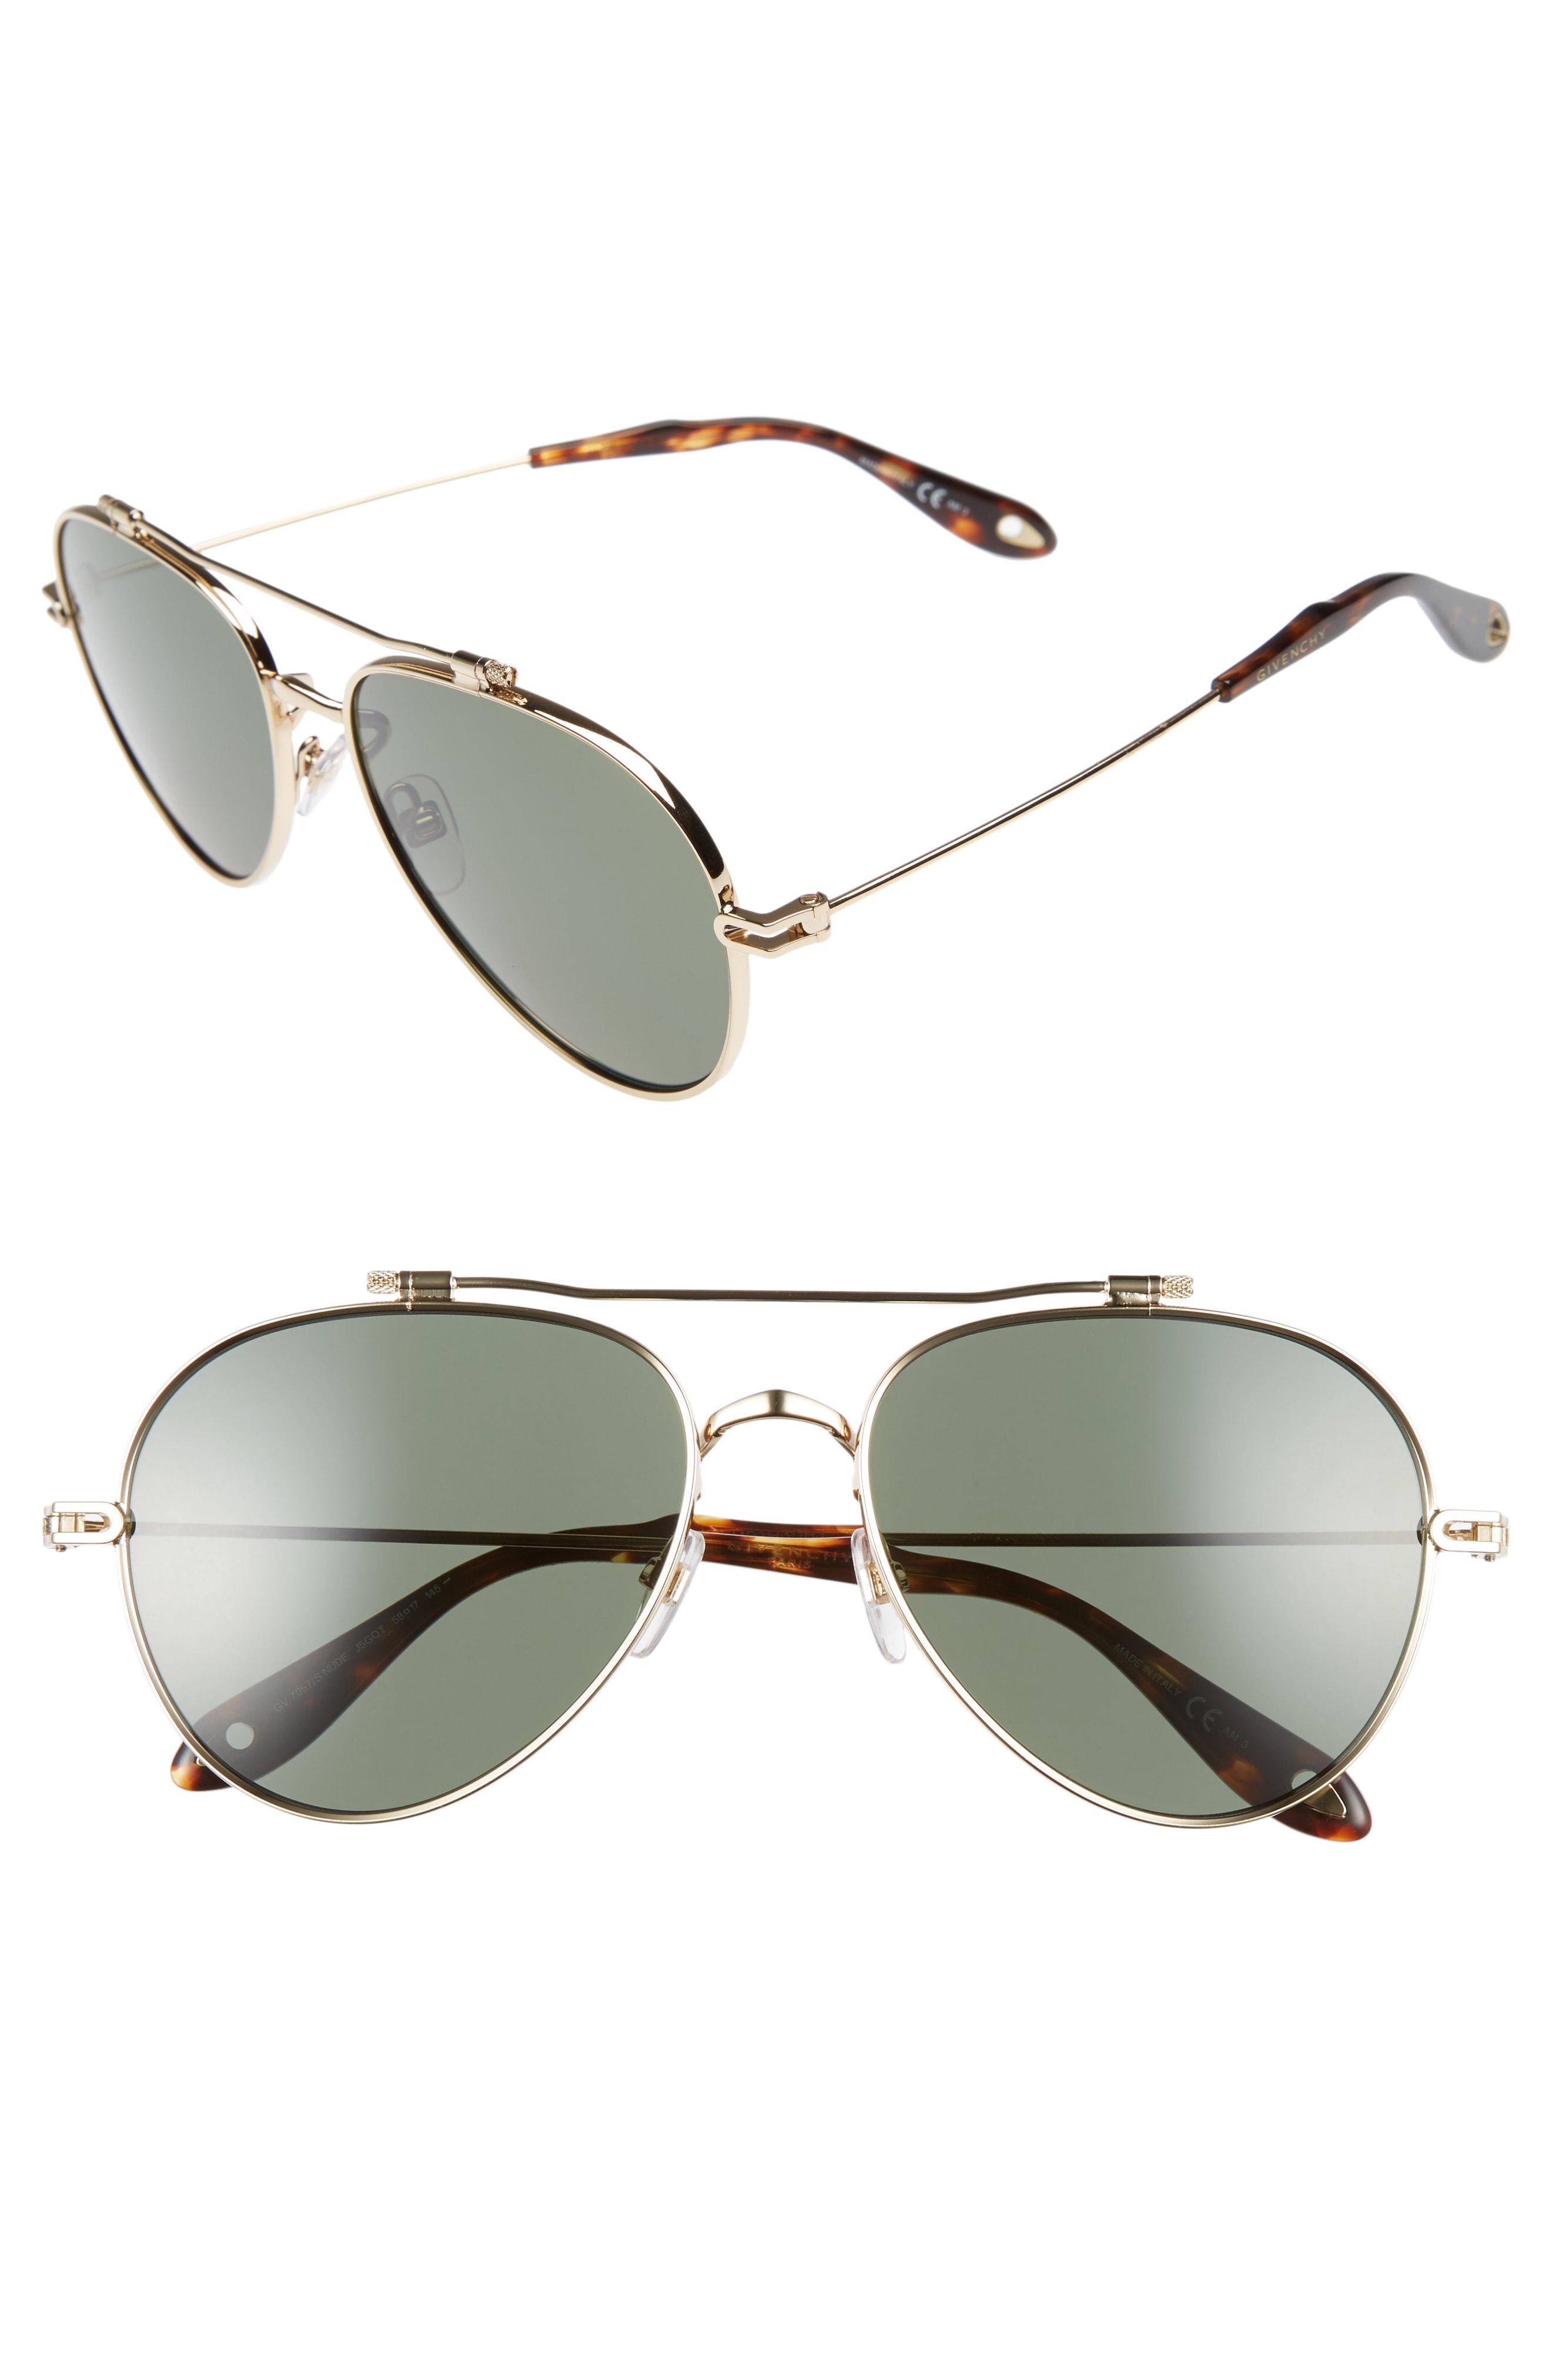 5c2b68631f6 Lyst - Givenchy 58mm Polarized Aviator Sunglasses - for Men